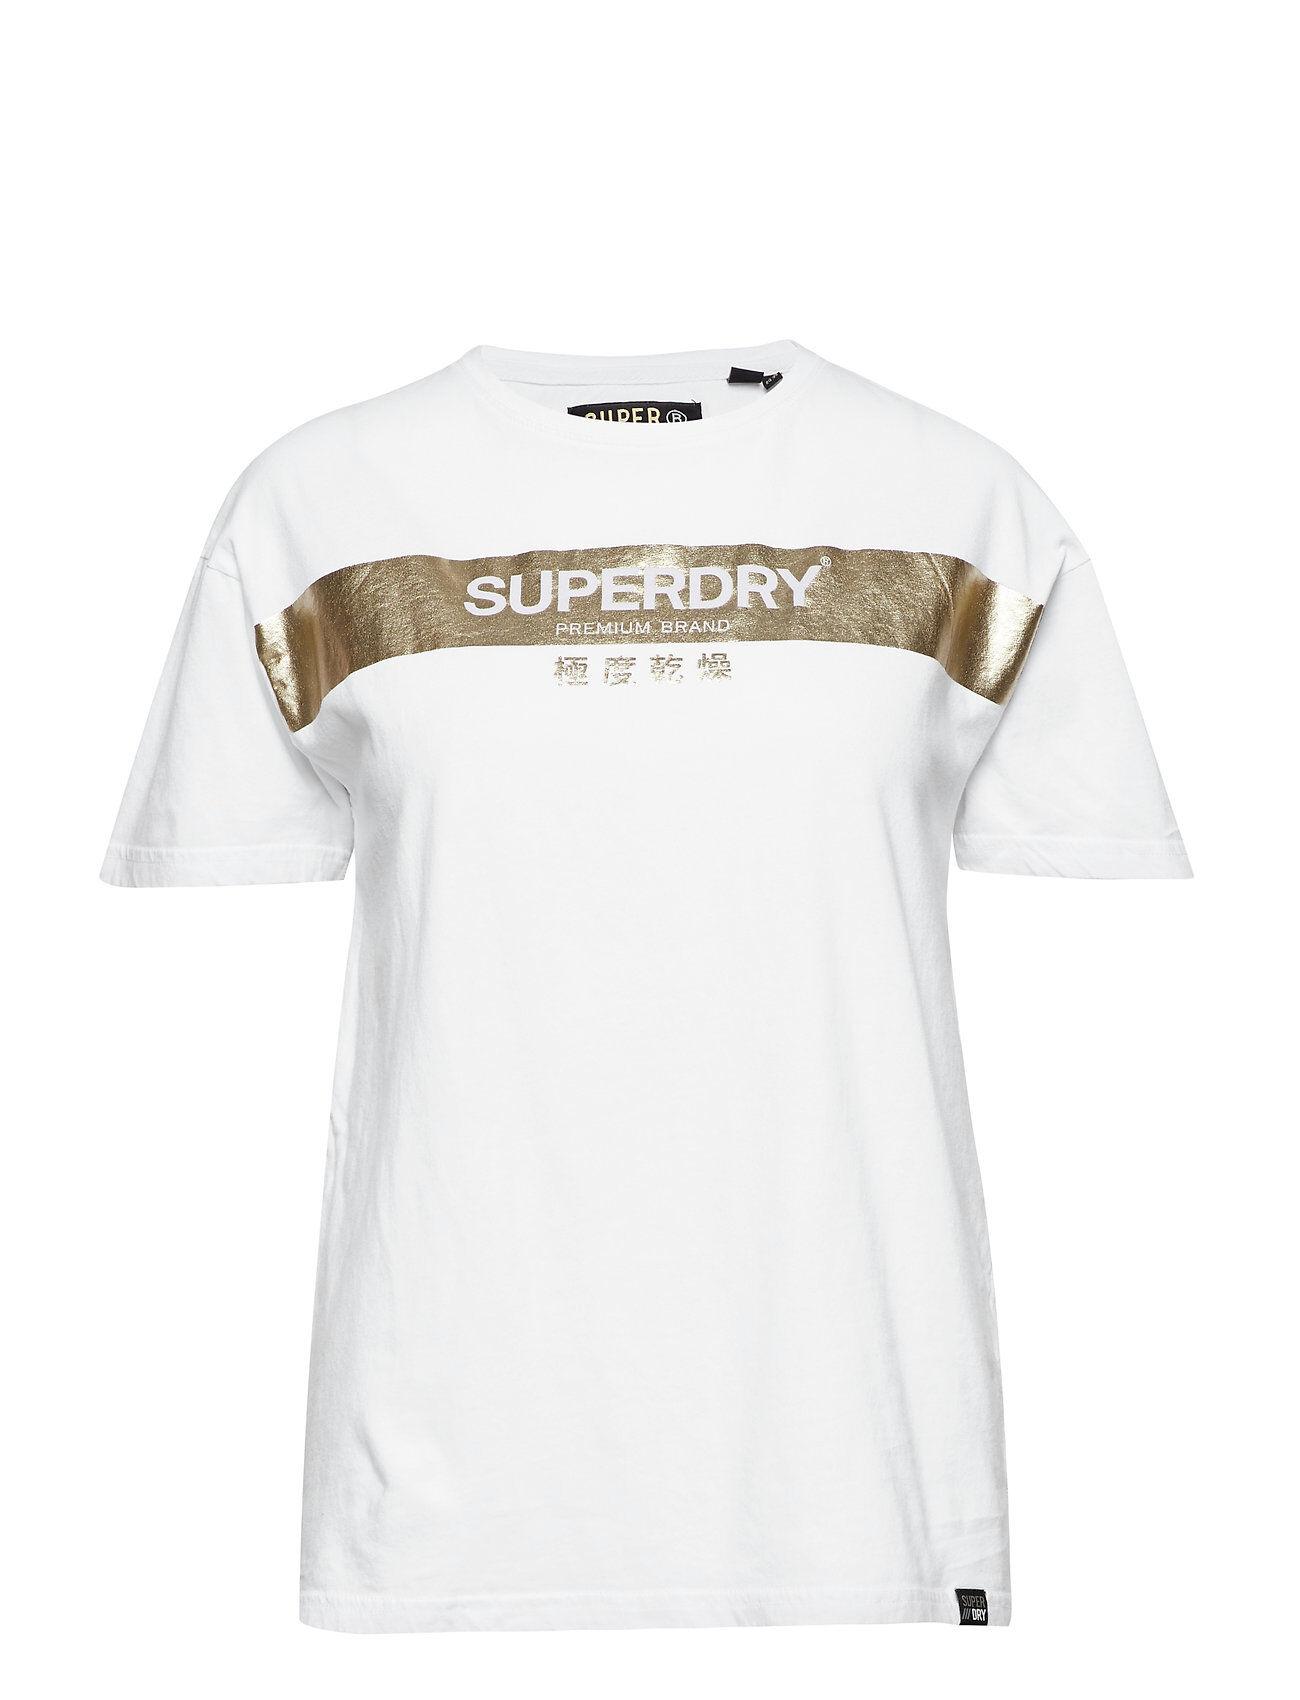 Superdry Premium Brand Foil Portland Tee T-shirts & Tops Short-sleeved Valkoinen